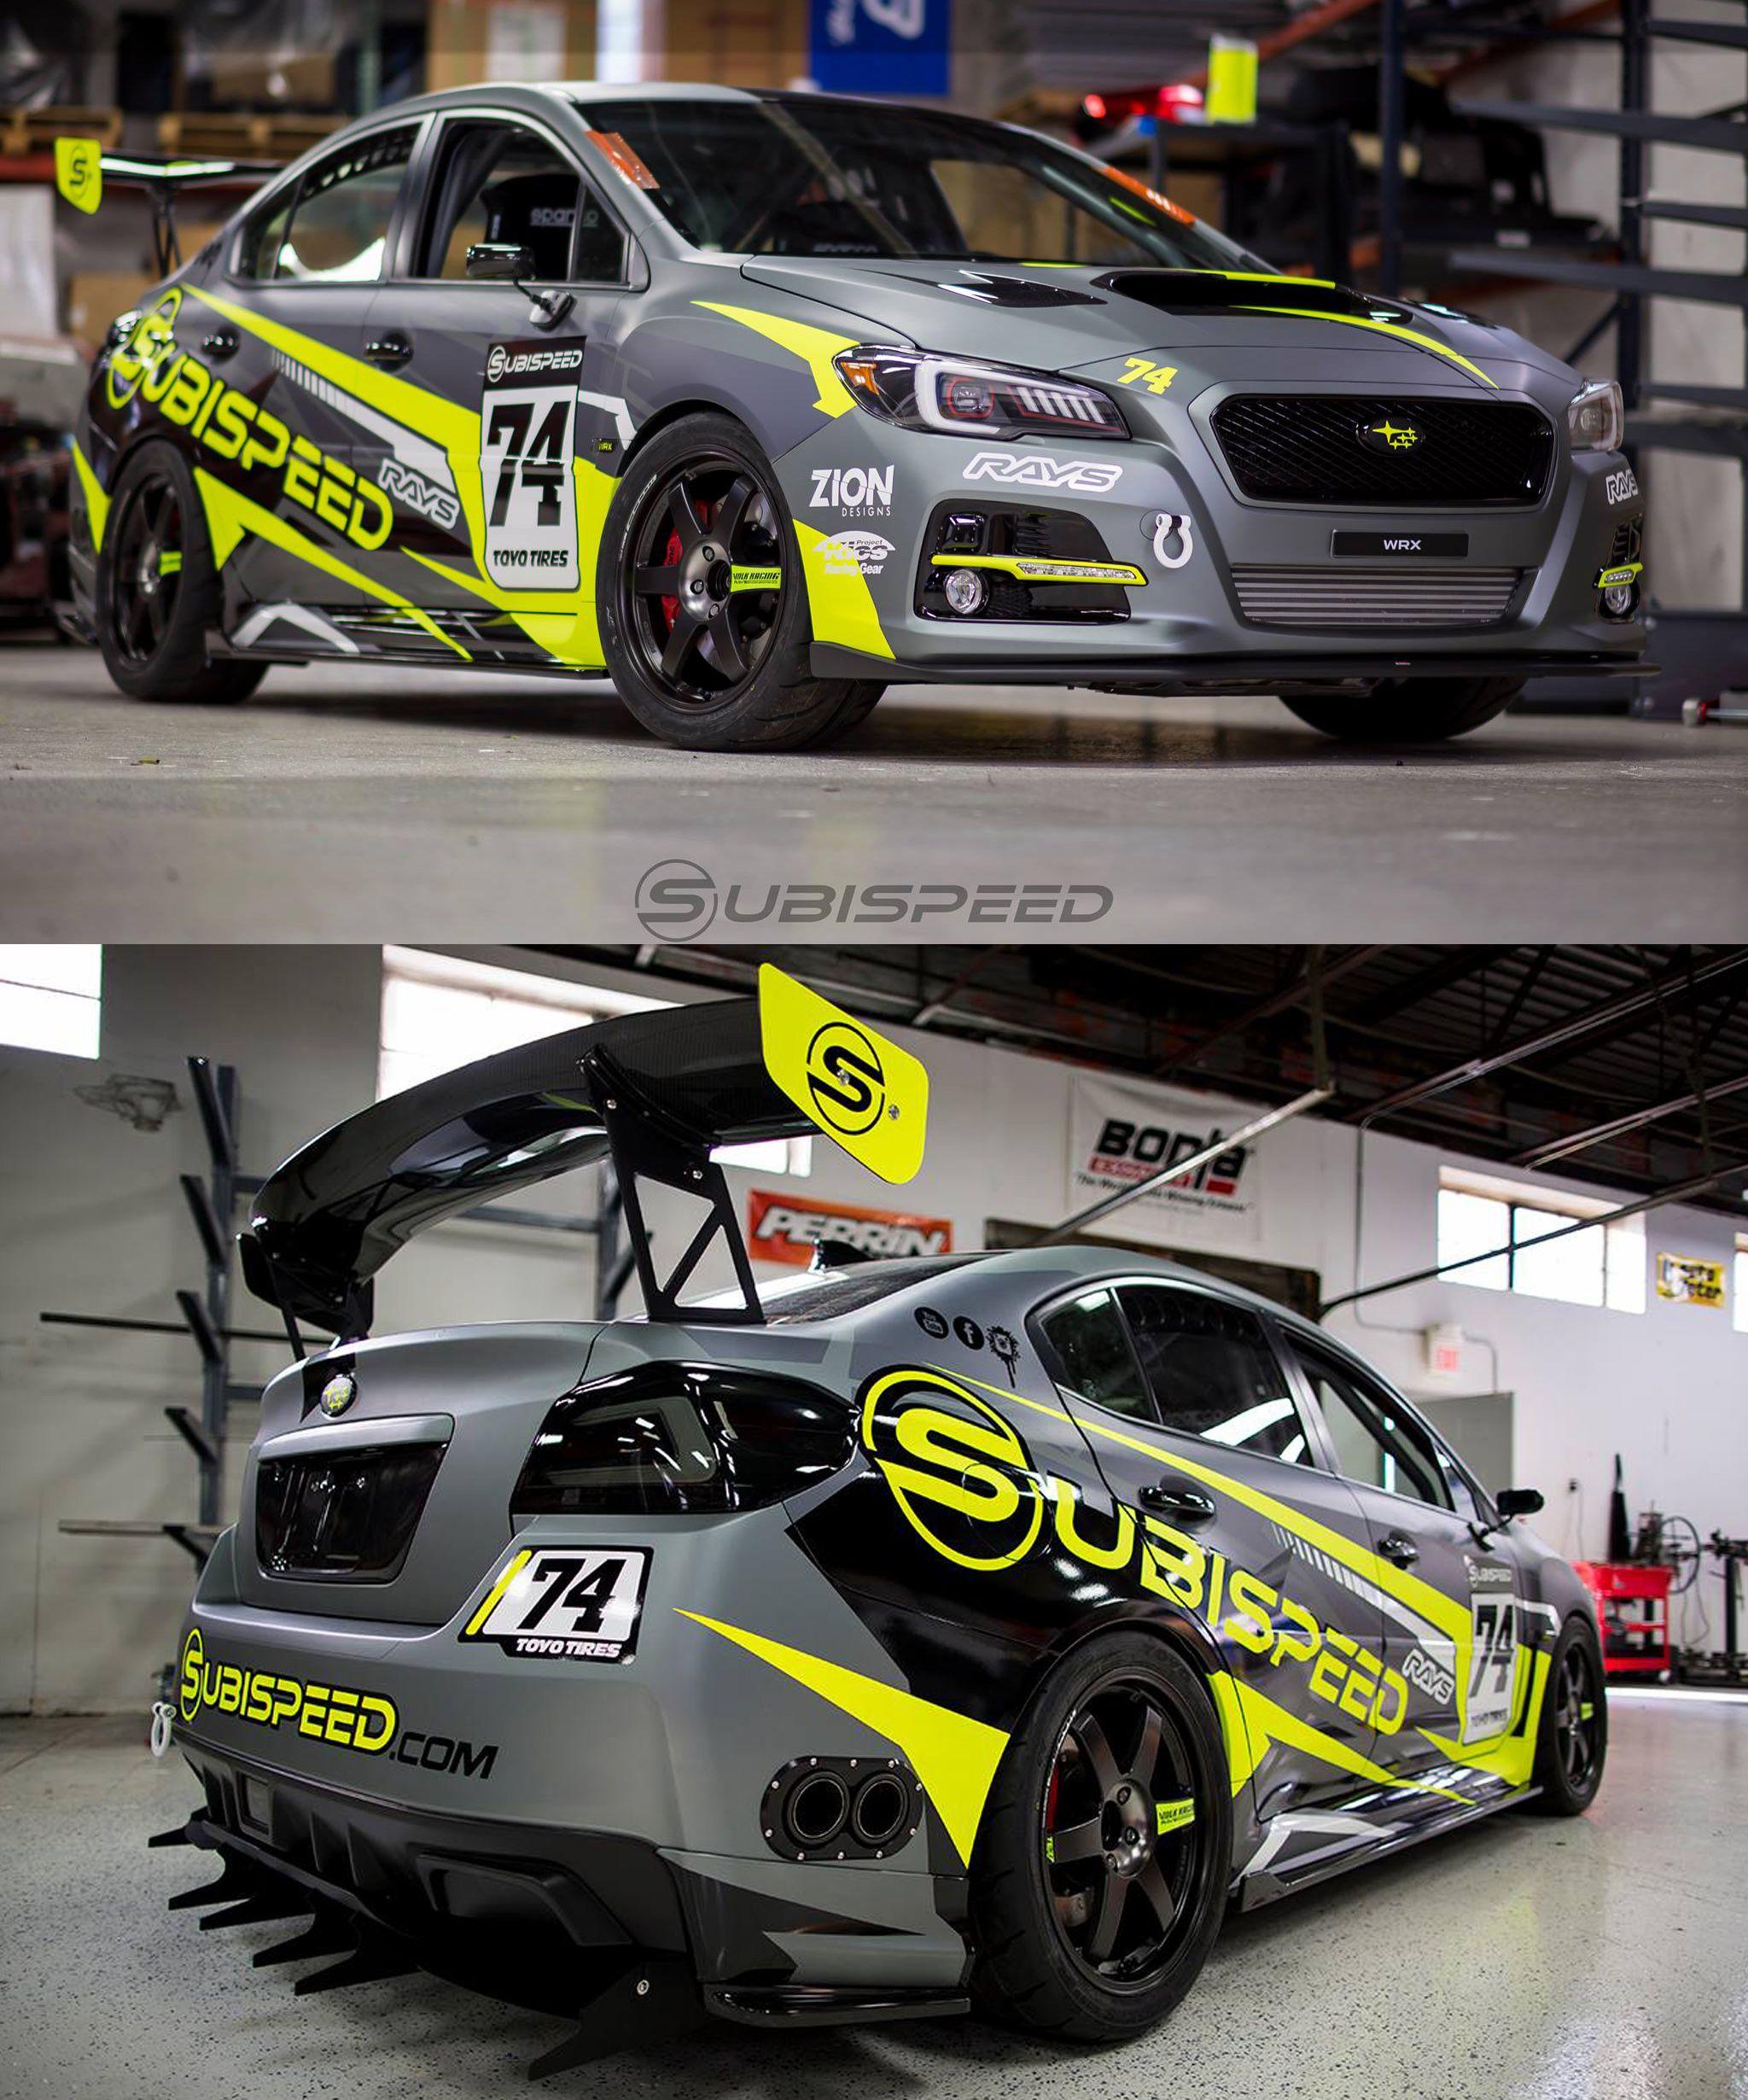 New car sticker design - Subaru Wrx Sti Cars Stickersdecals